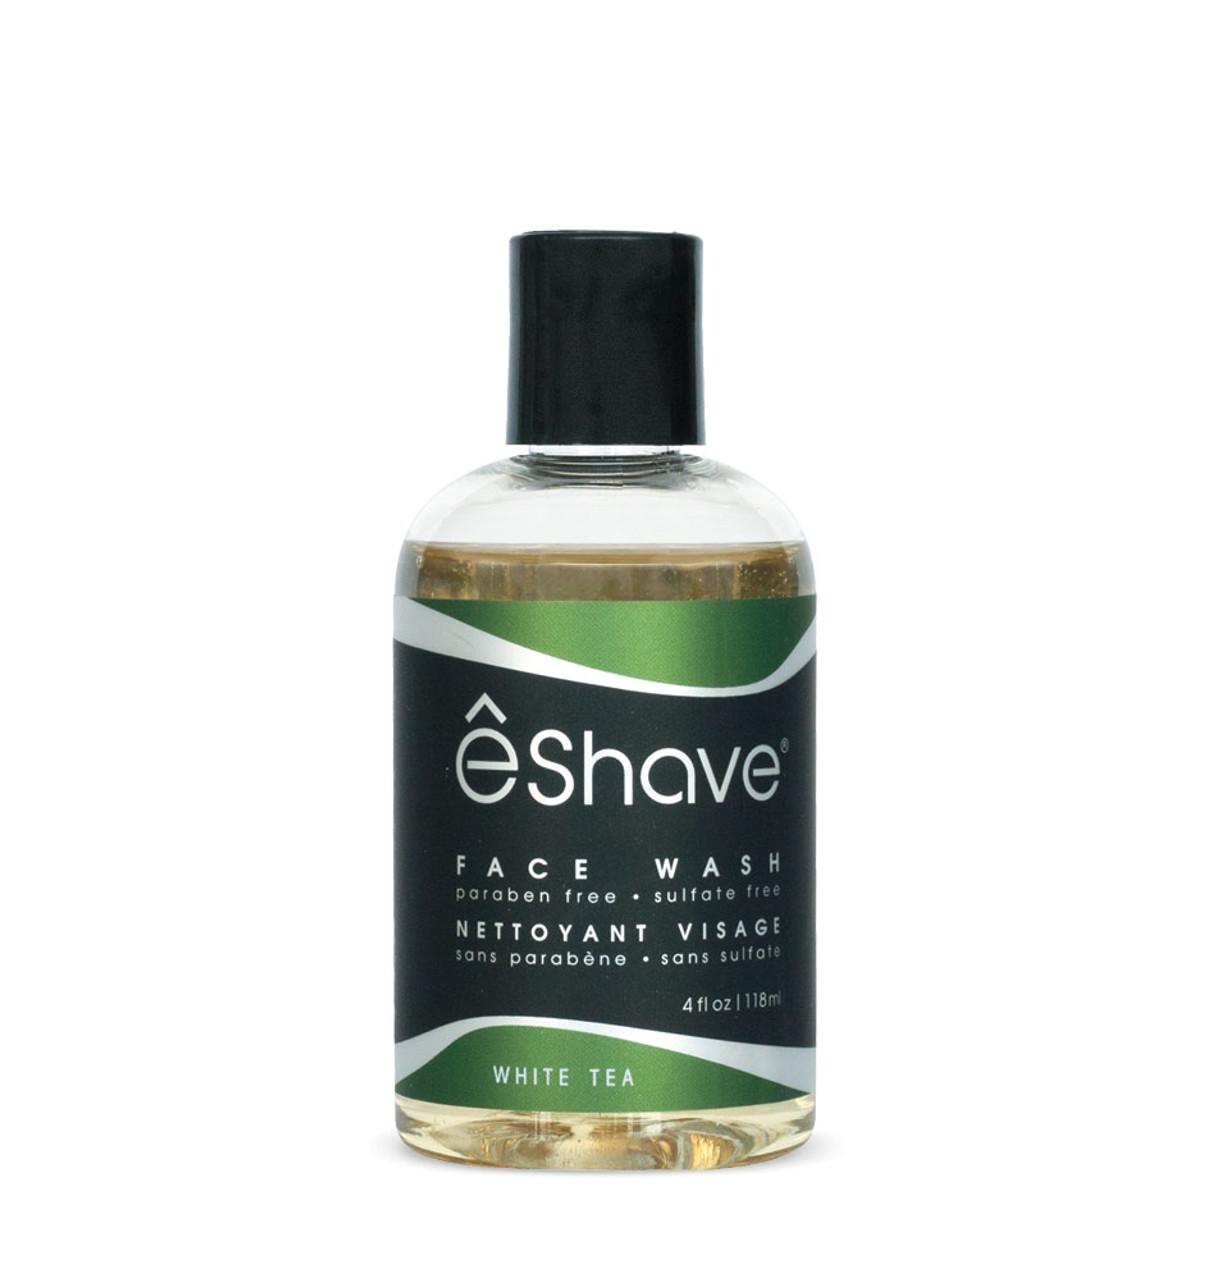 eShave White Tea Face Wash 4 oz